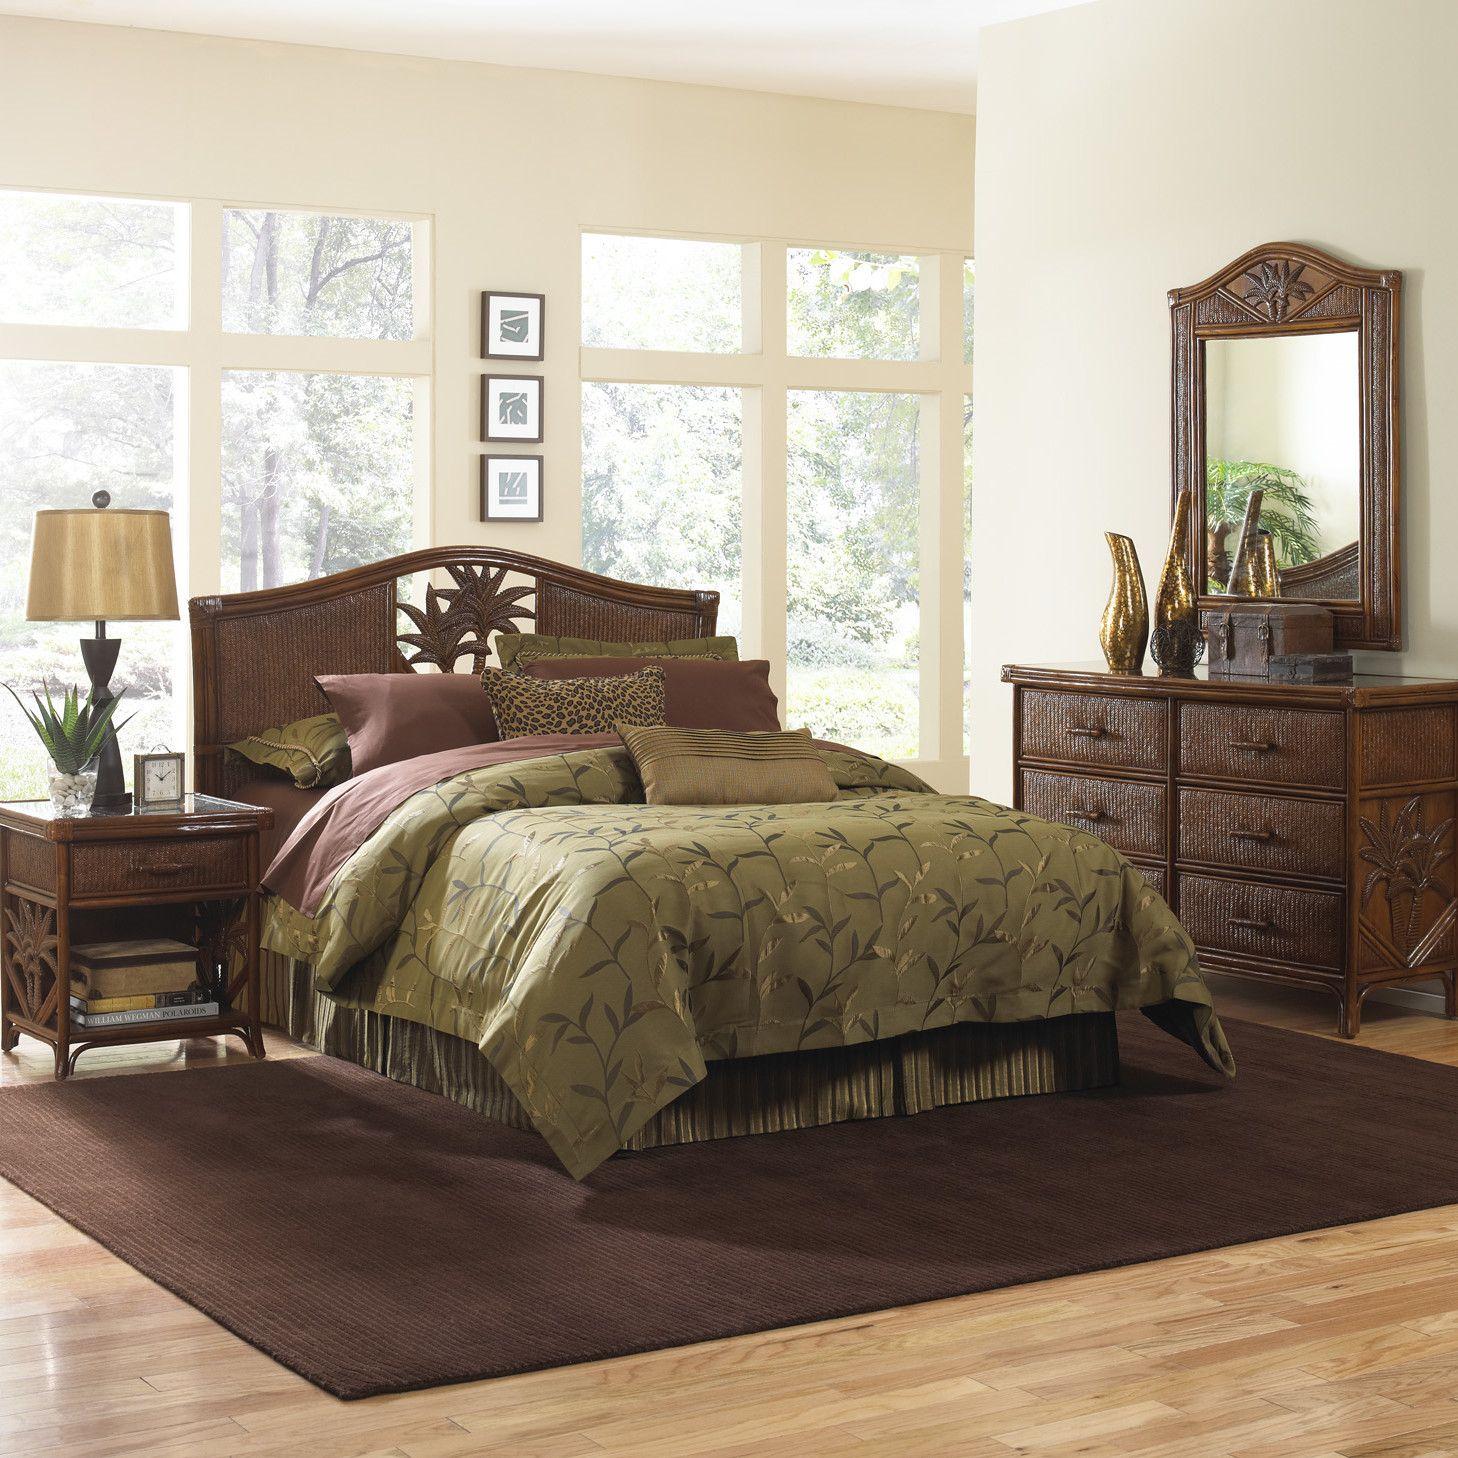 Bay Isle Home Cypress Platform 4 Piece Bedroom Set